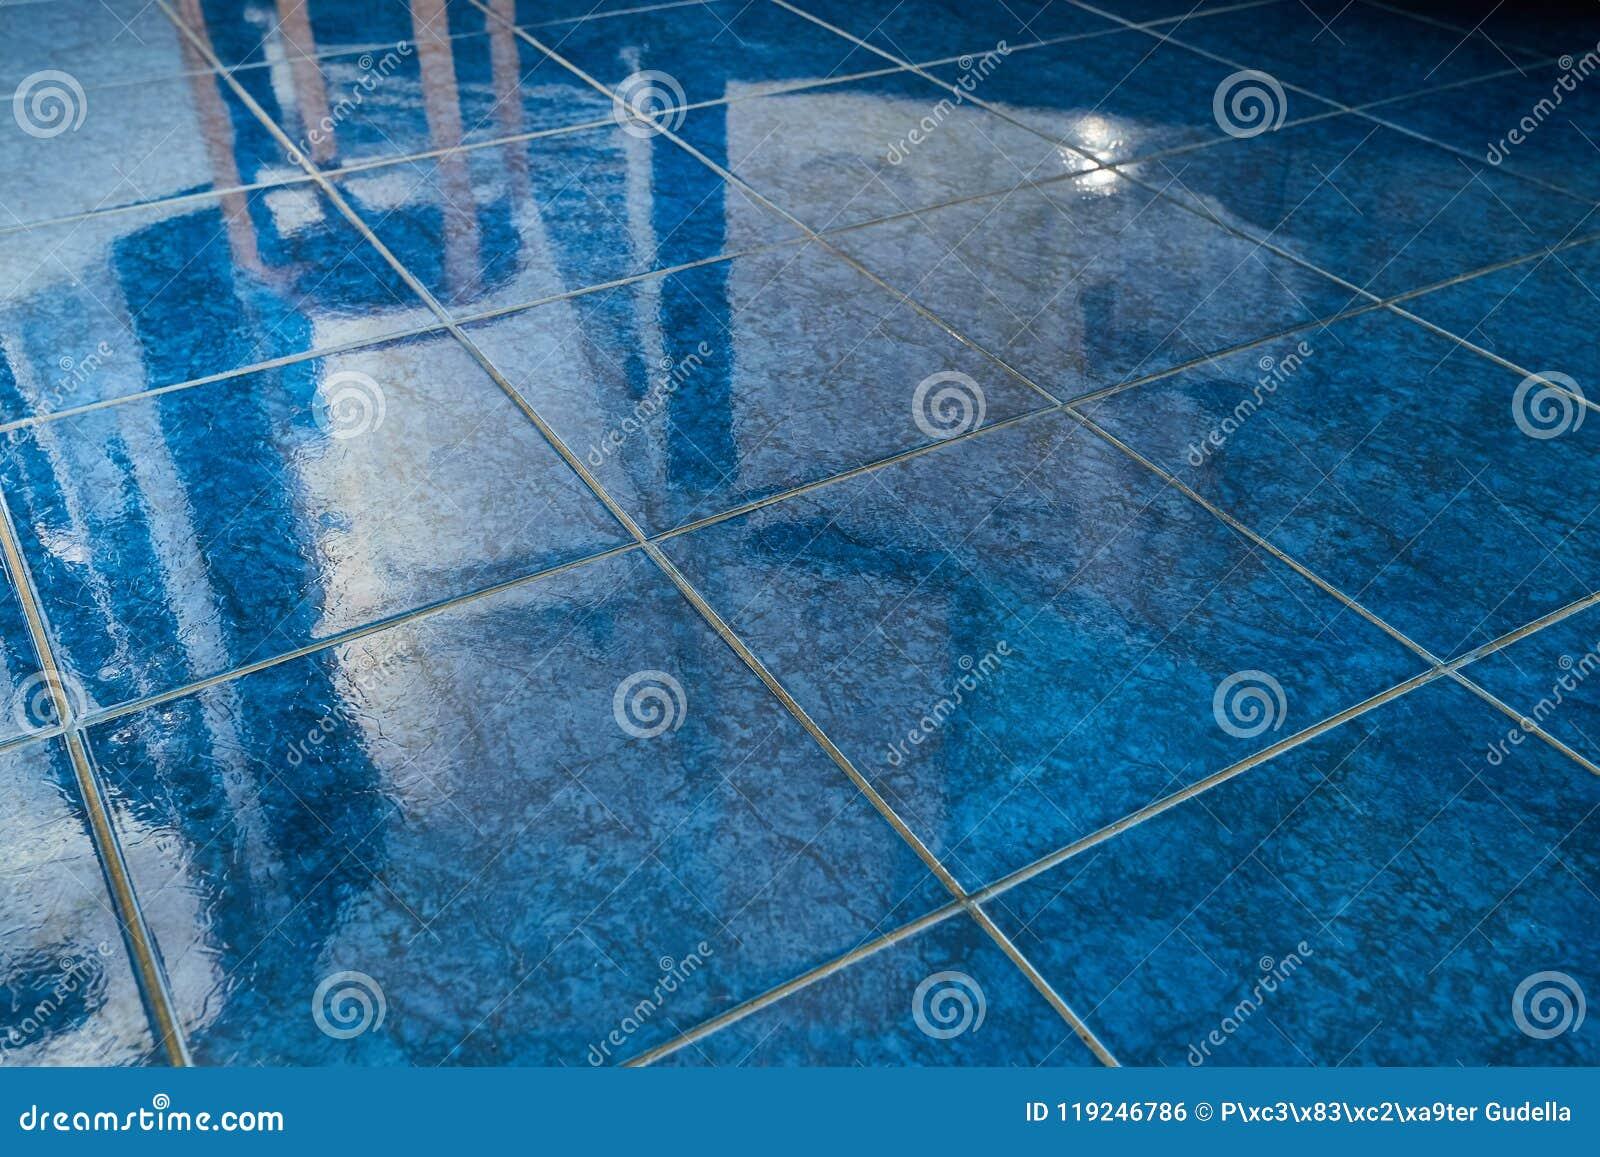 Tiled bathroom floor stock photo. Image of floor, light - 119246786